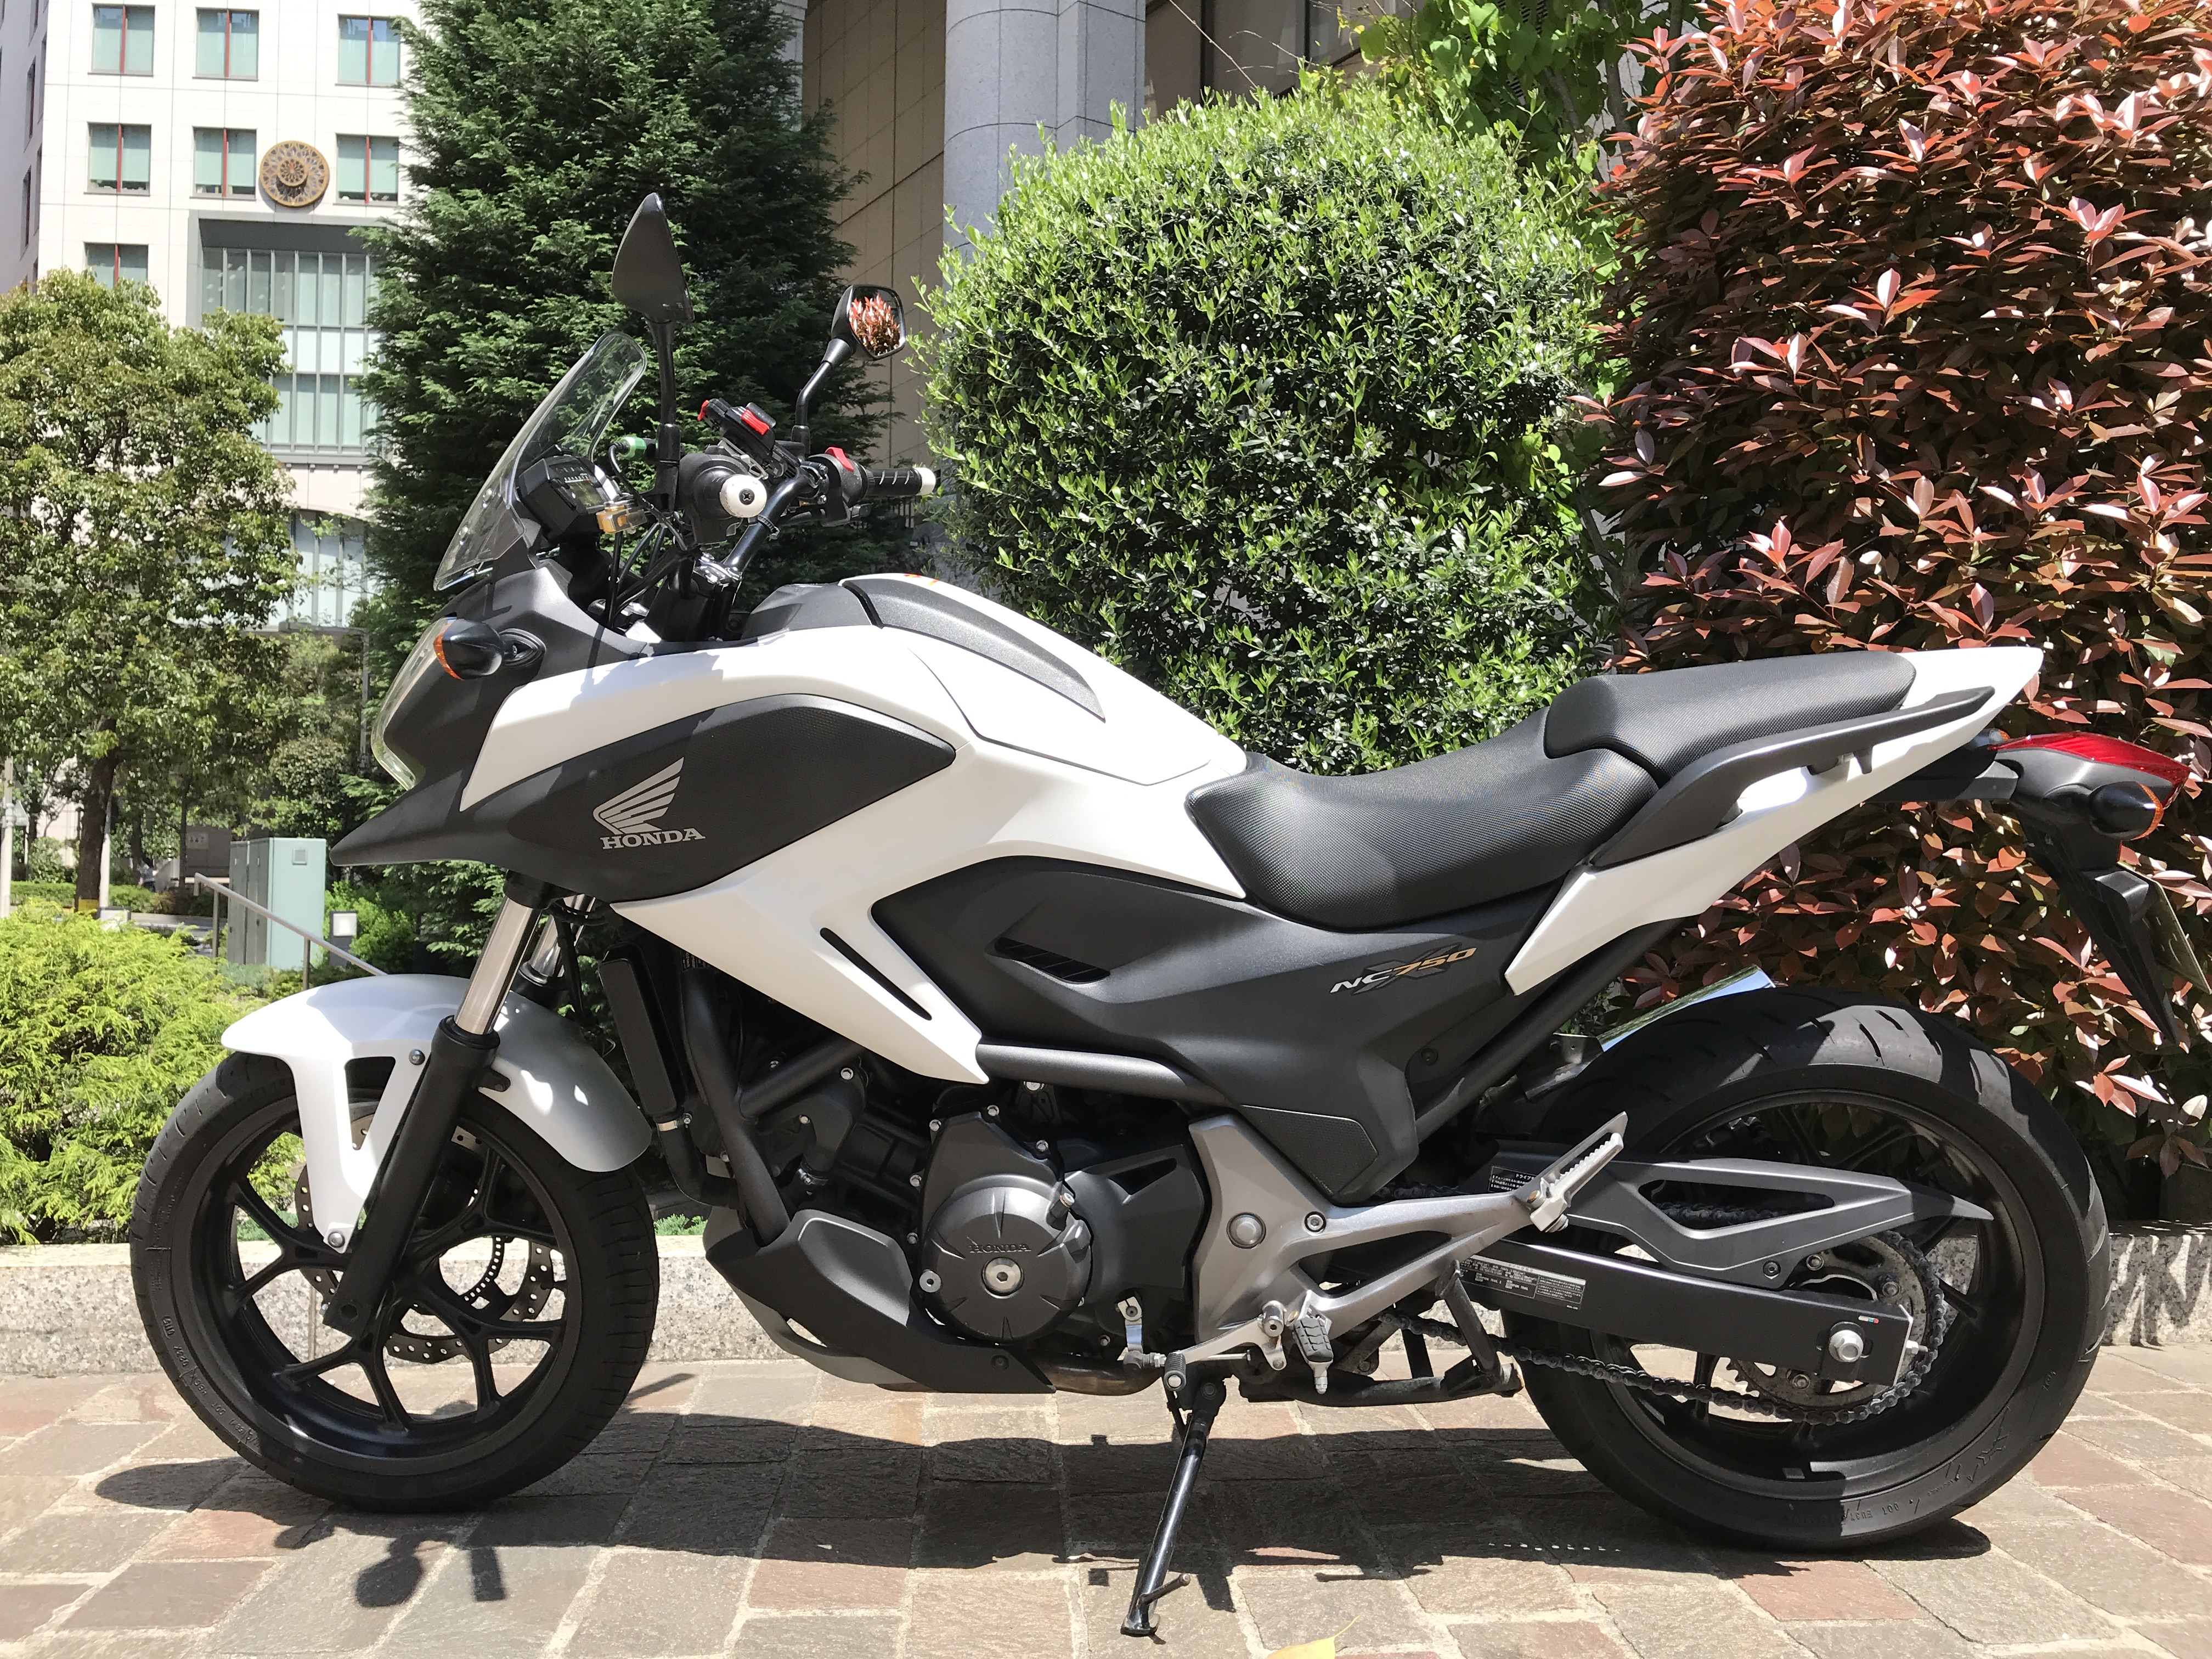 NC750X (HN-00) - 【公式】レンタルバイクのベストBike® 船橋駅前